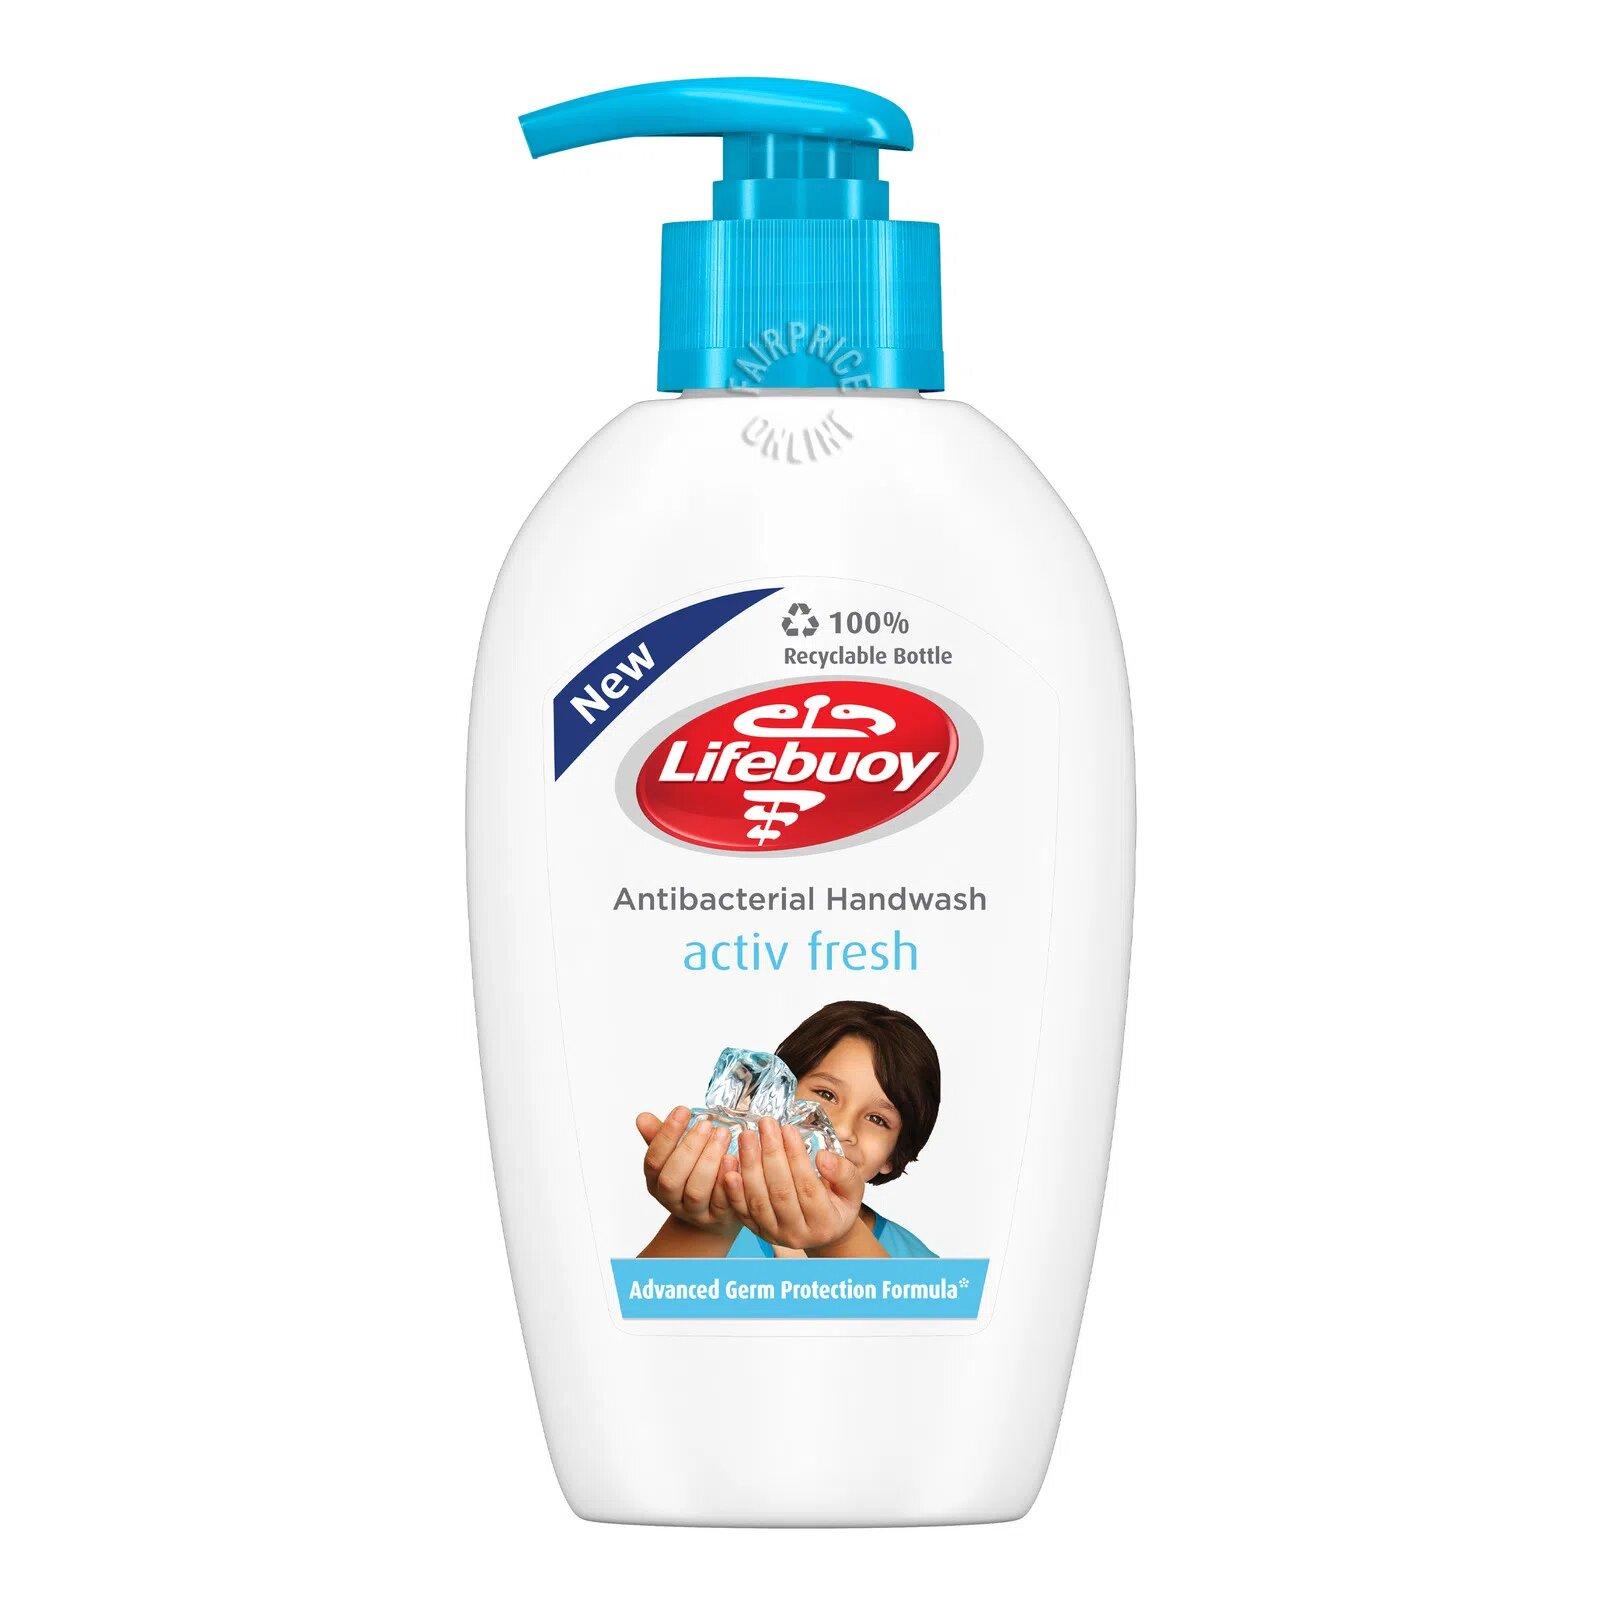 Lifebuoy Antibacterial Handwash - Activ Fresh (Menthol)